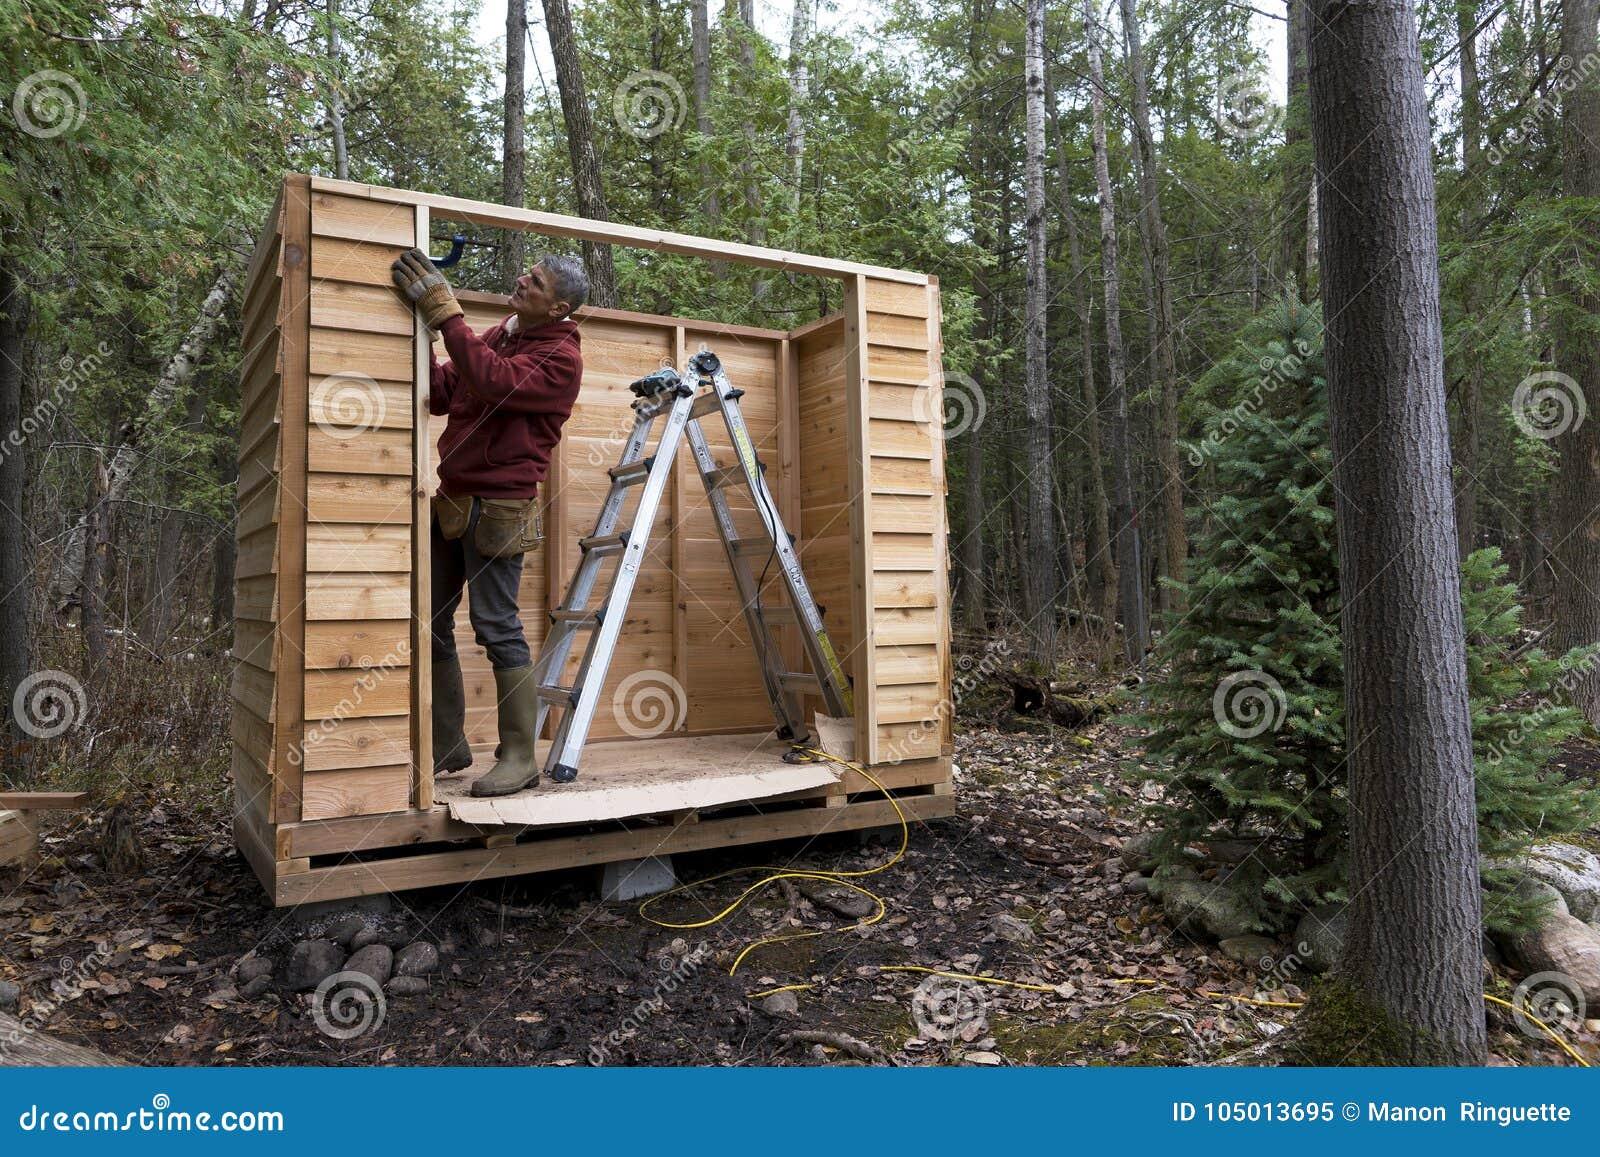 Handyman Building A Cedar Storage Shed Stock Image - Image